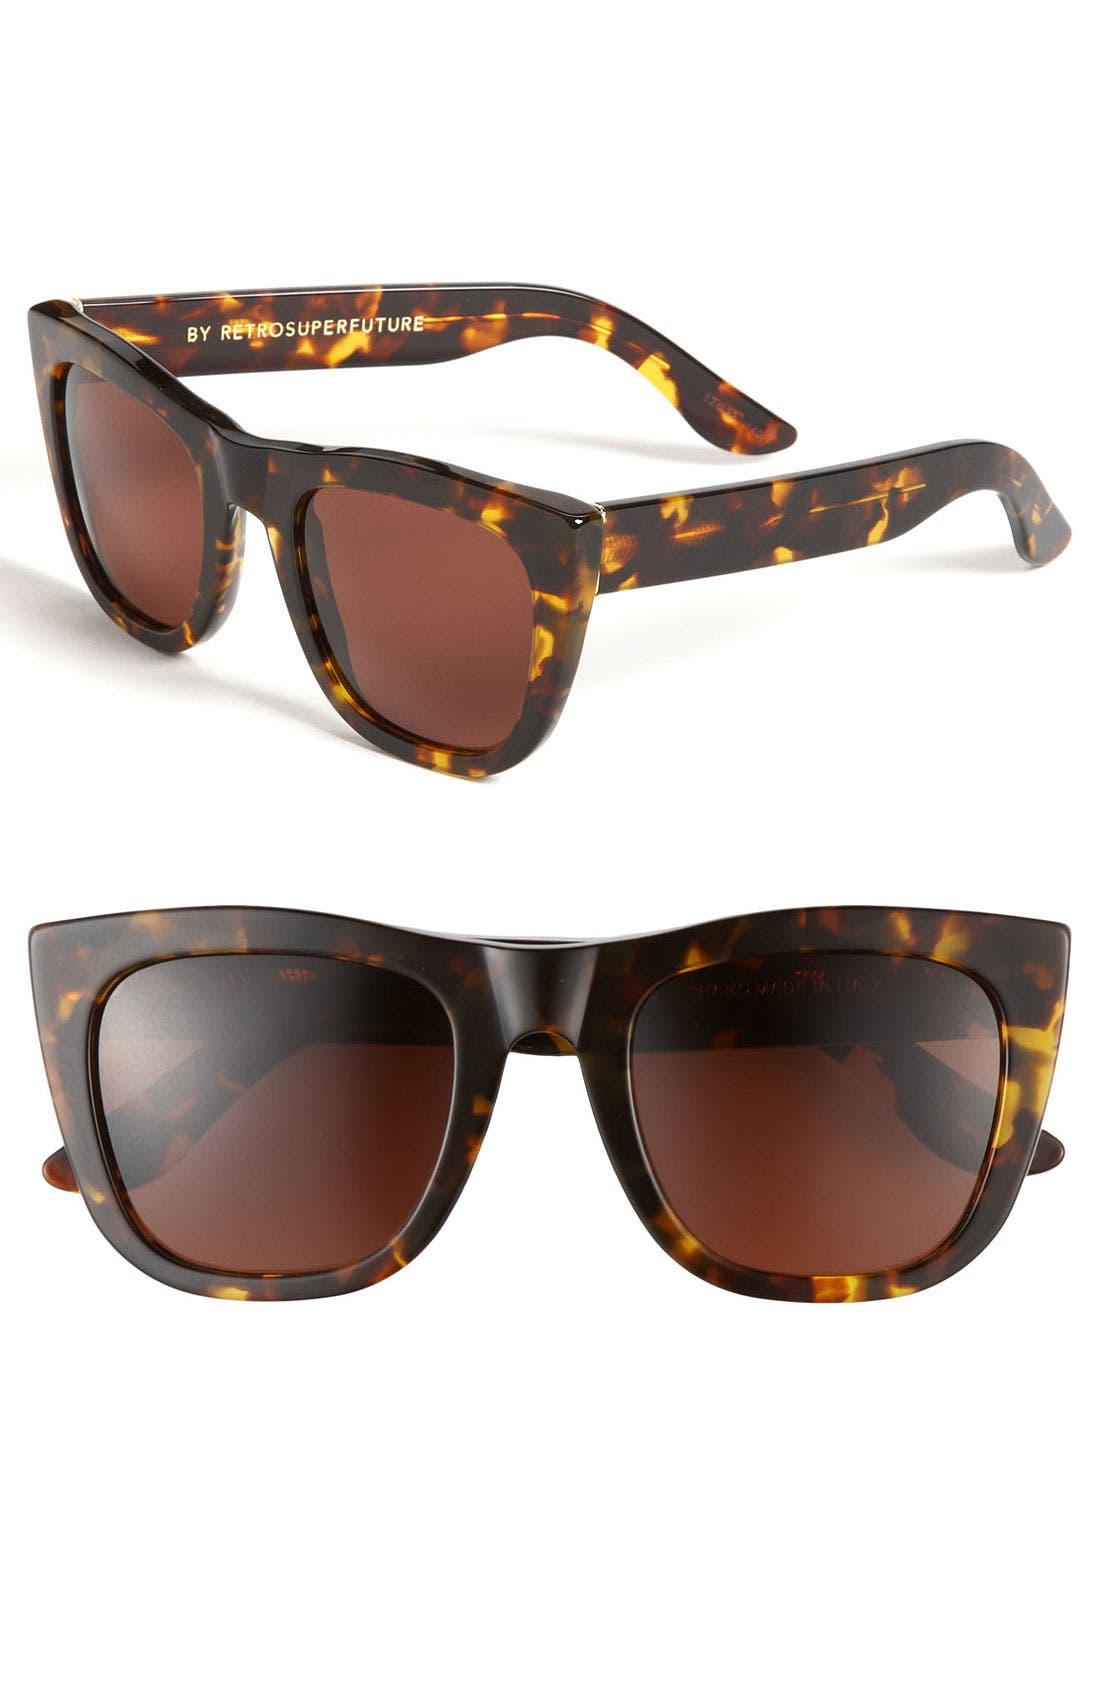 Alternate Image 1 Selected - SUPER by RETROSUPERFUTURE® 'Gals' Sunglasses